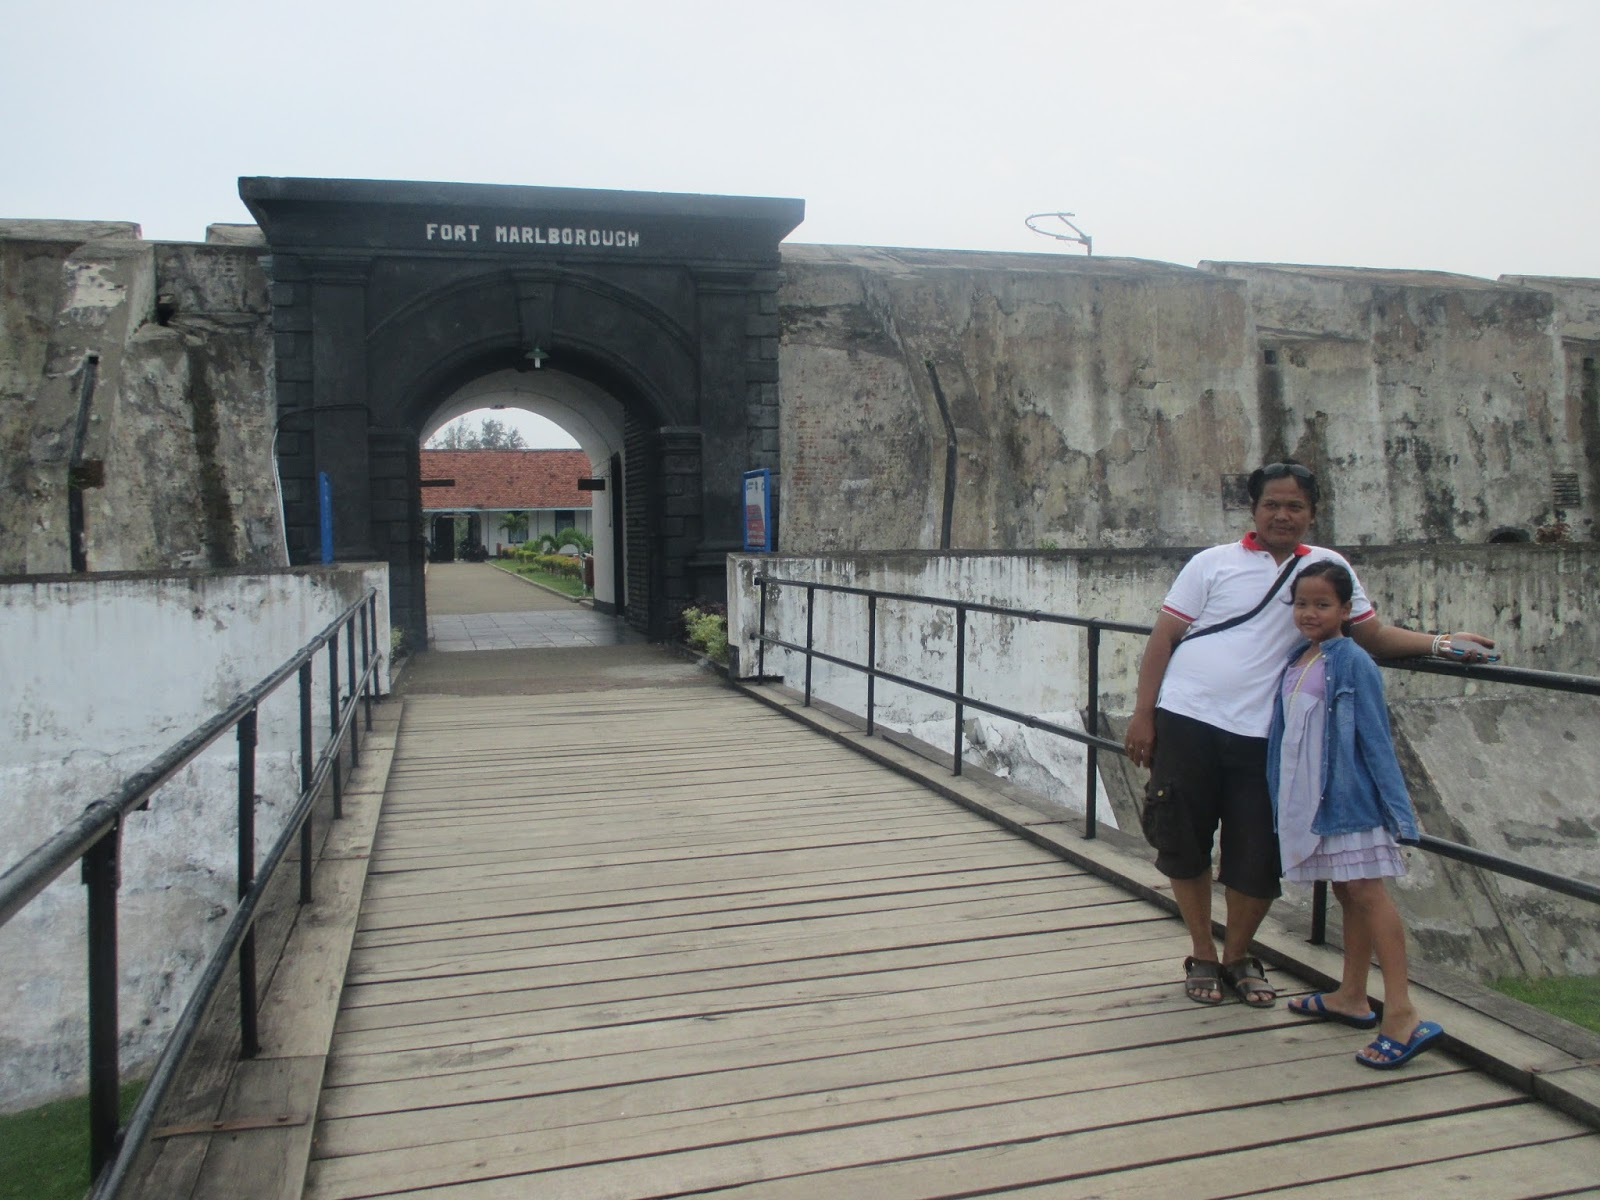 Duatiket Indonesia Travel Blog Fort Marlborough Benteng Sejarah Nah Kunjungi